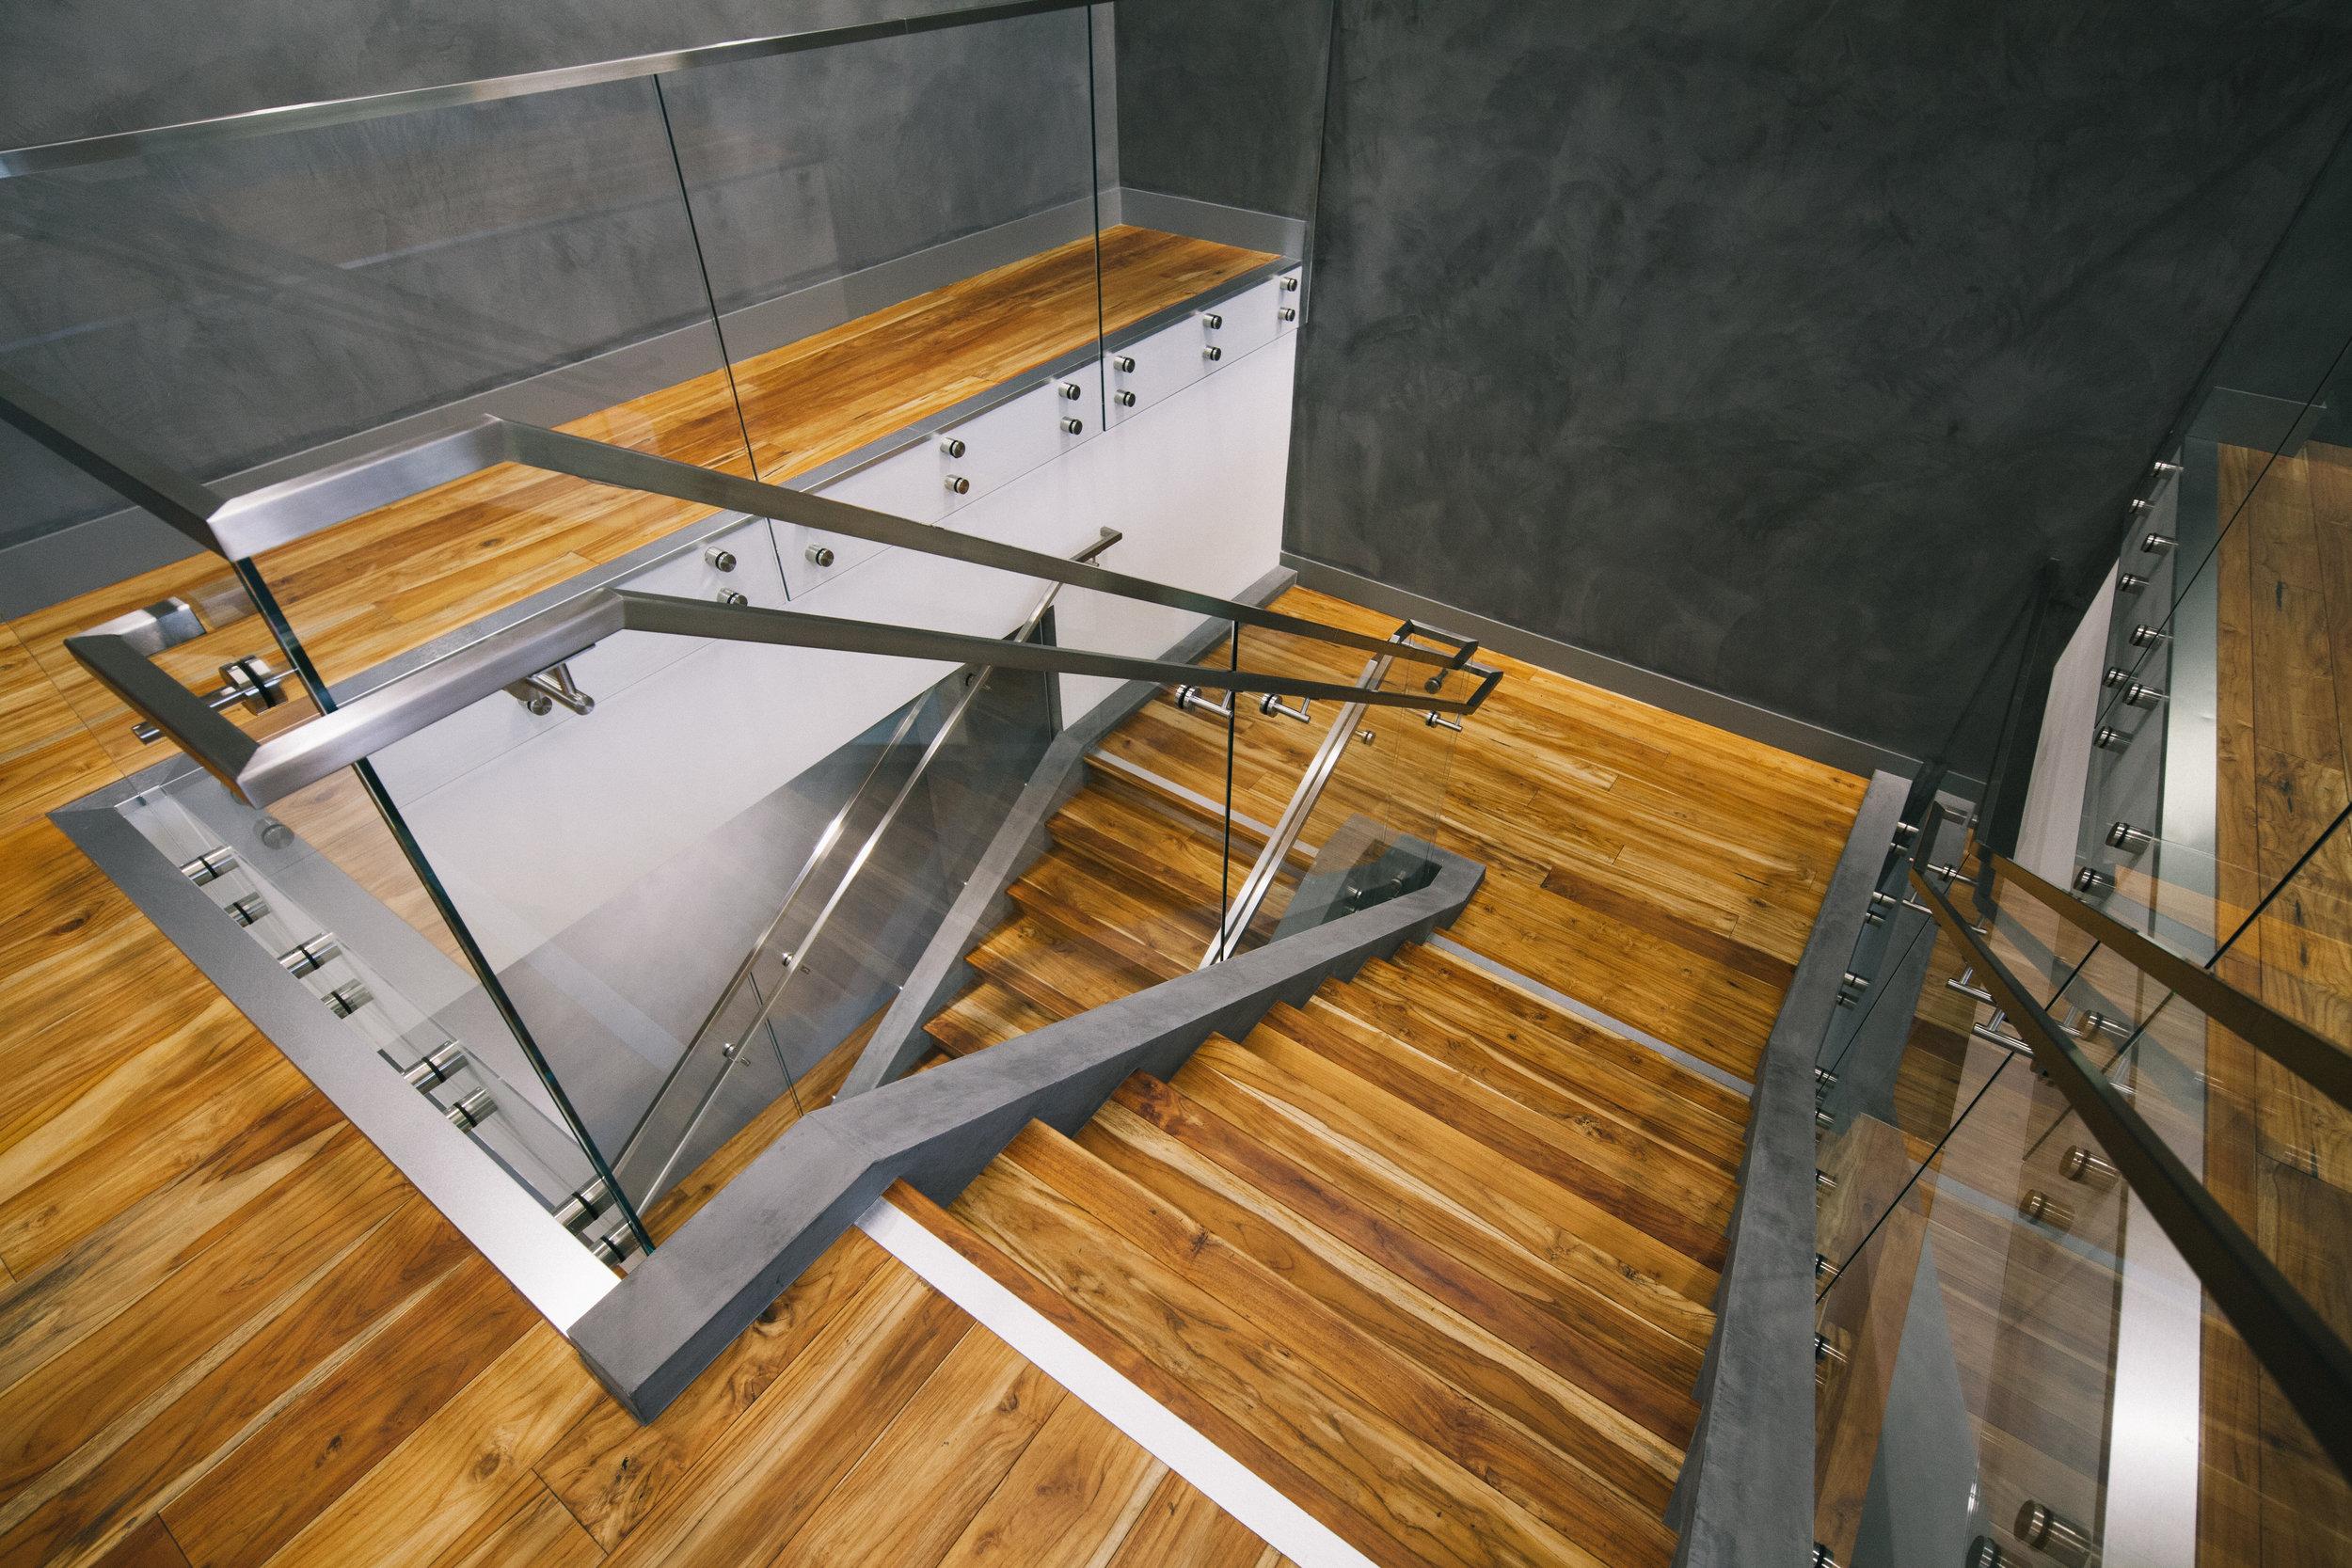 S.E.A.-Studio-Environmental-Architecture-David-Hertz-FAIA-First-Pacific-Advisors-Los-Angeles-tenant-improvement-sustainable-regenerative-restorative-green-design-office-sleek-modern-interior-Westside-commercial-building-professional-workplace-10.jpg